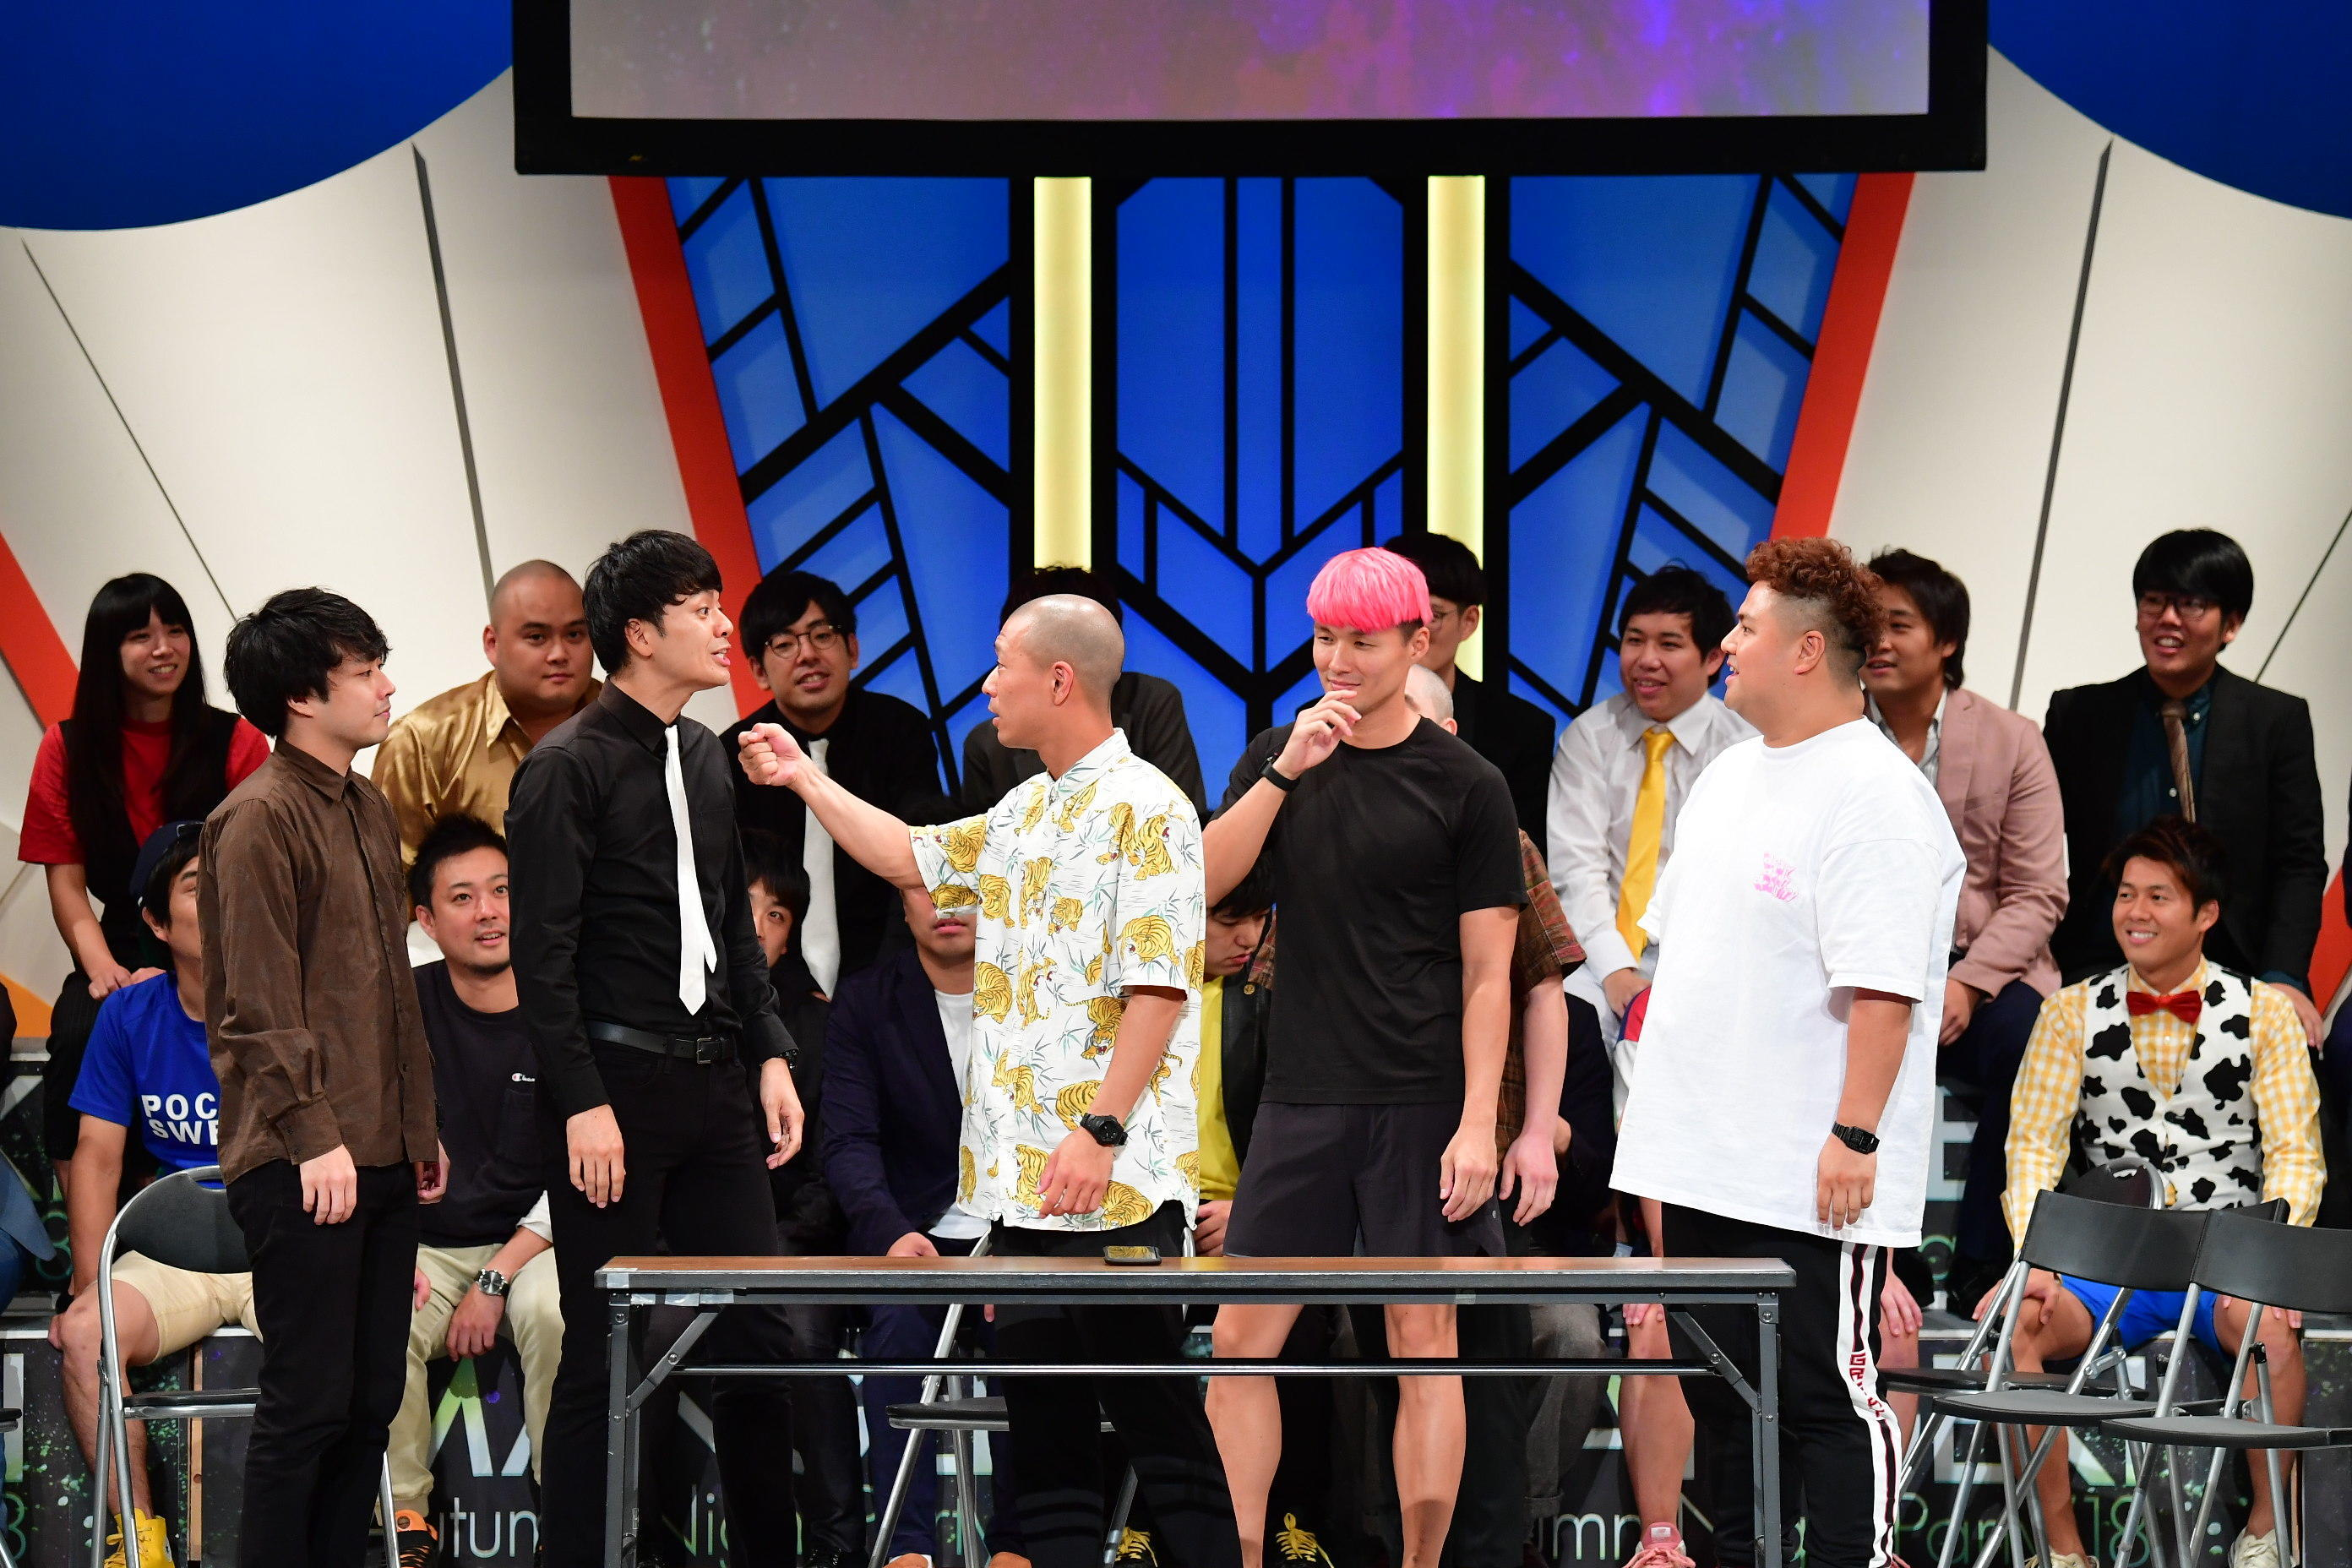 http://news.yoshimoto.co.jp/20180925141425-b3f7f27e00faac0ab06fb7d5dfc7249fc9094aa4.jpg